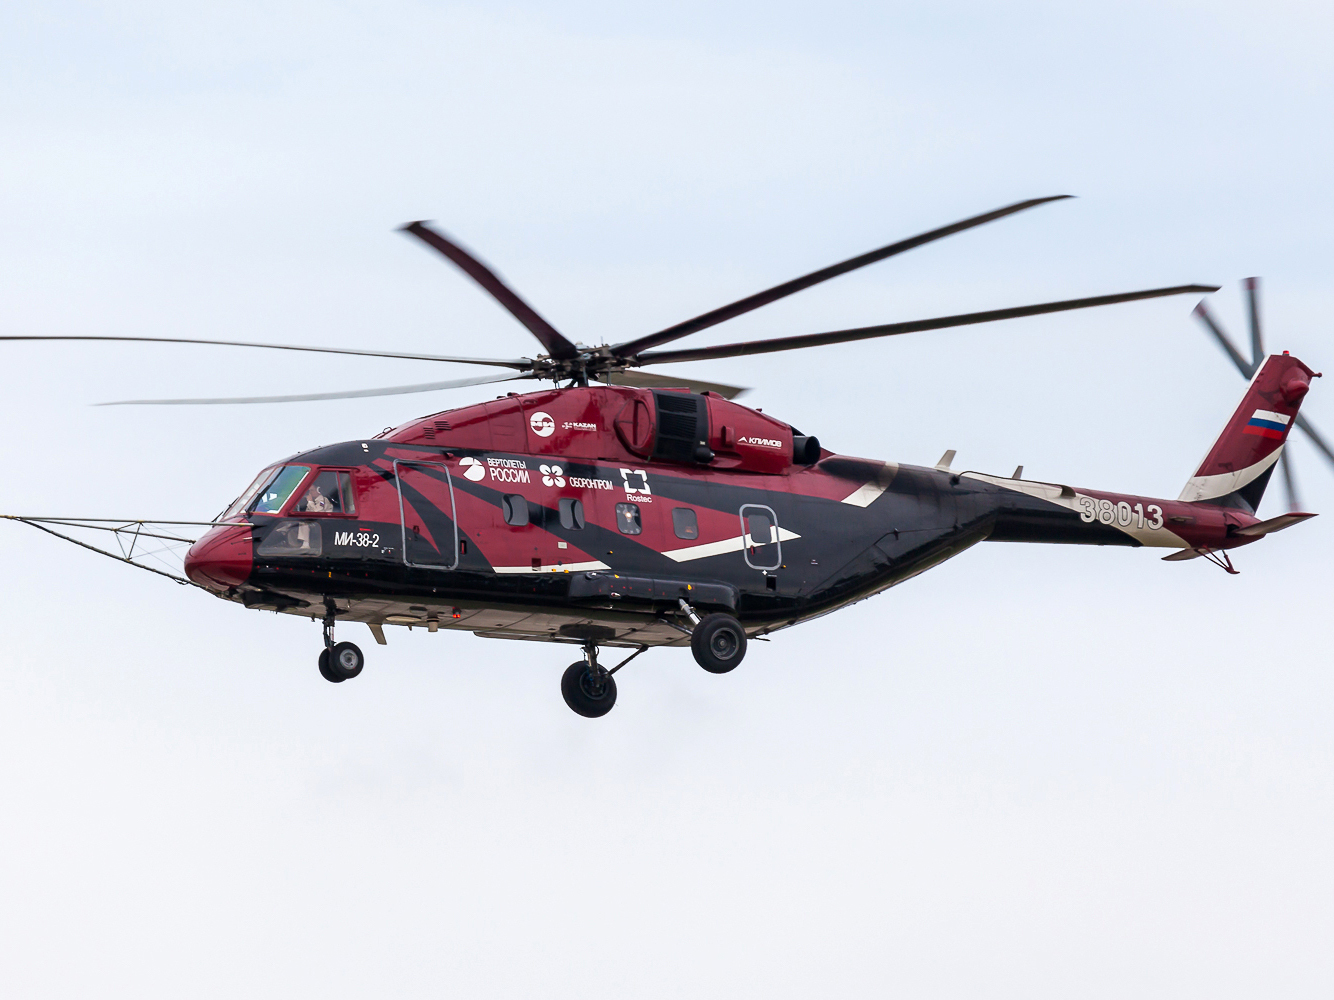 russian helicopters новости статьи обзоры rostec